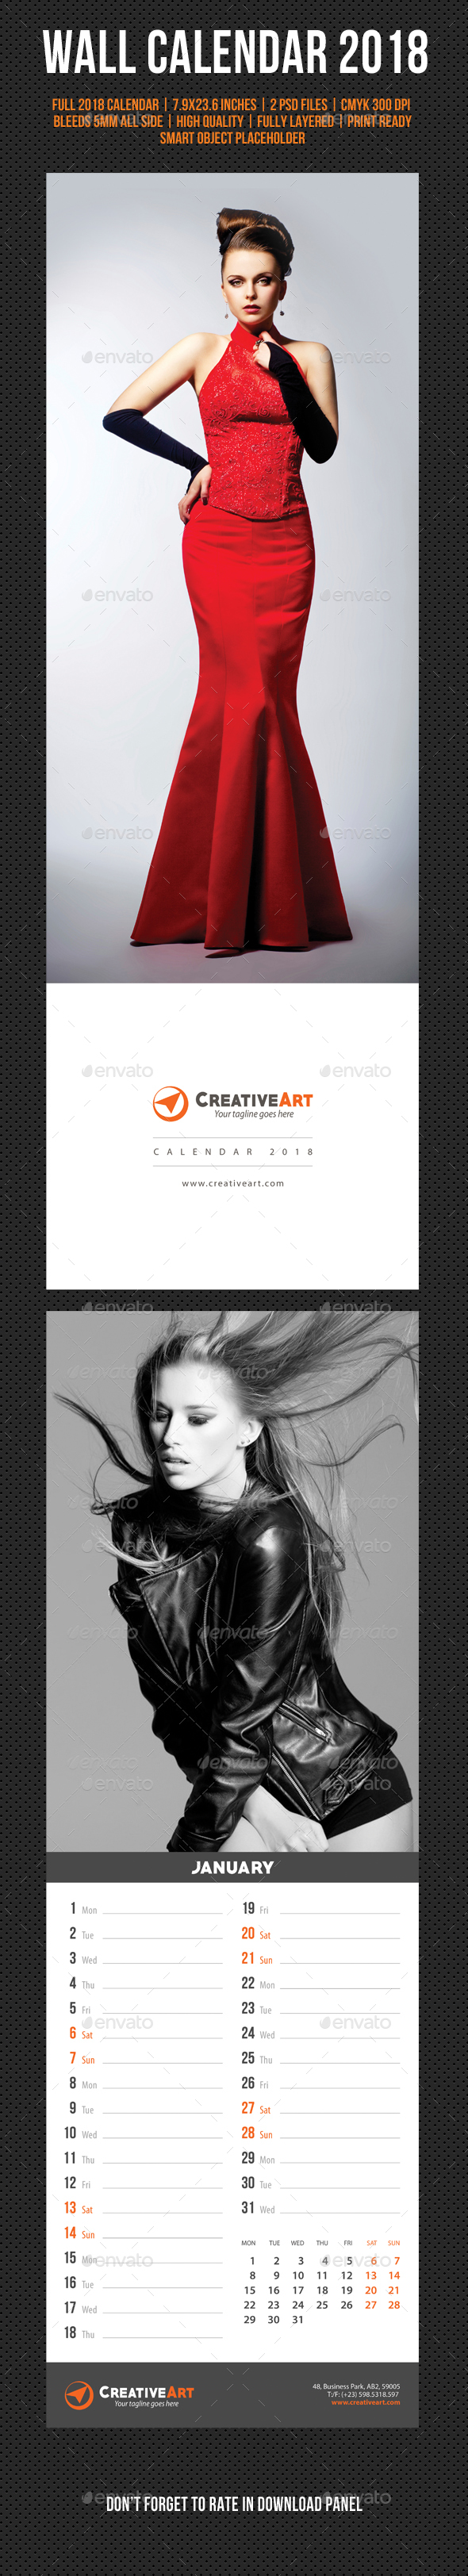 Creative Wall Calendar 2018 V05